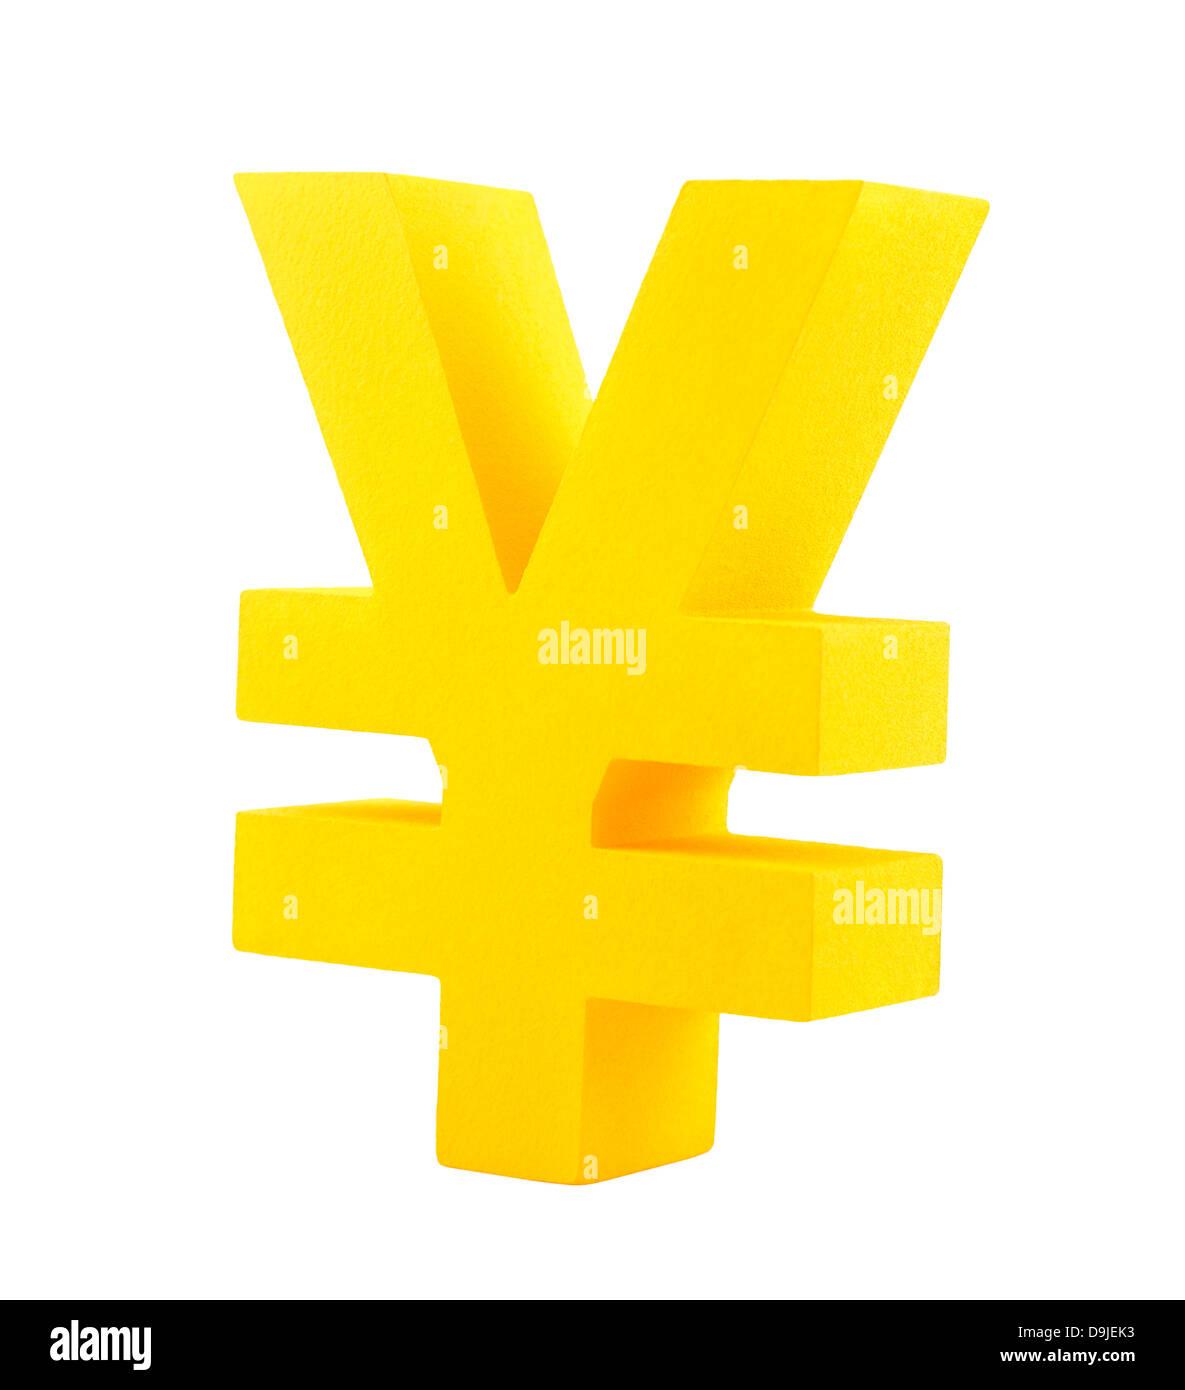 Golden yen symbol isolated on white - Stock Image